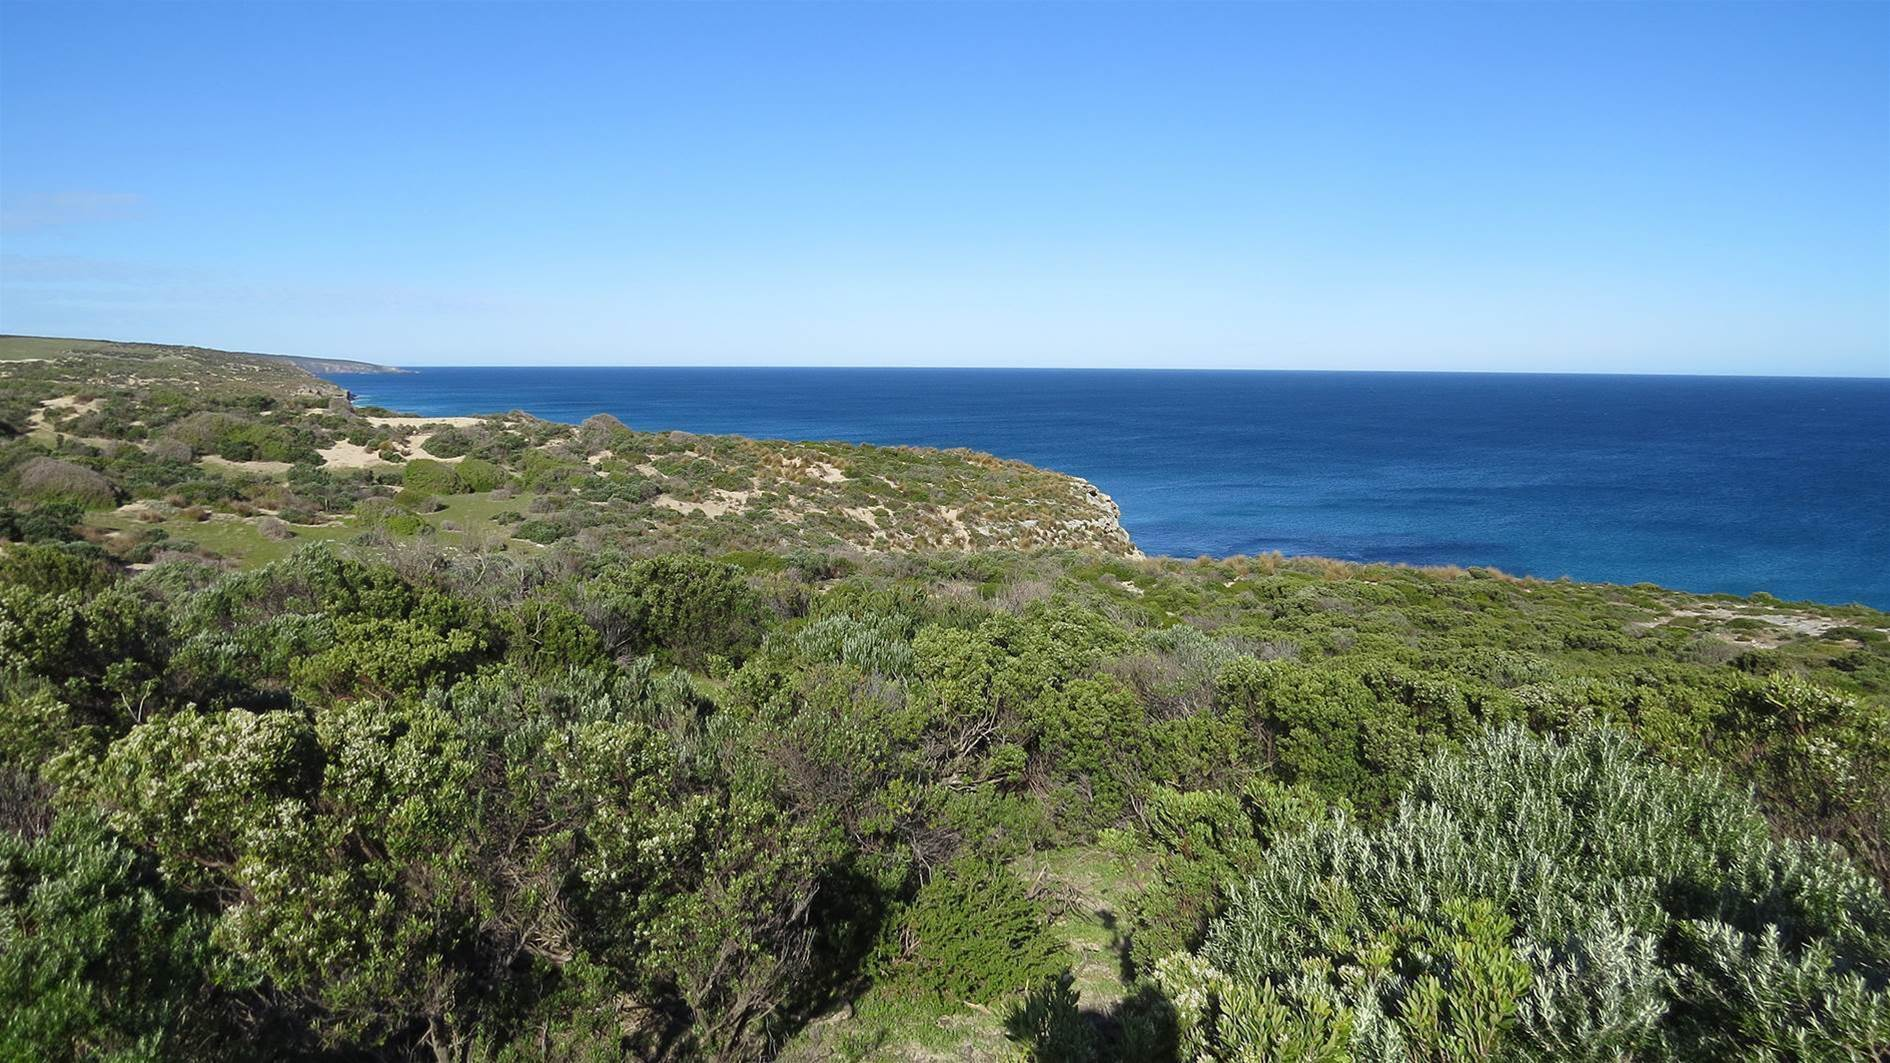 Spectacular Kangaroo Island course gets the green light